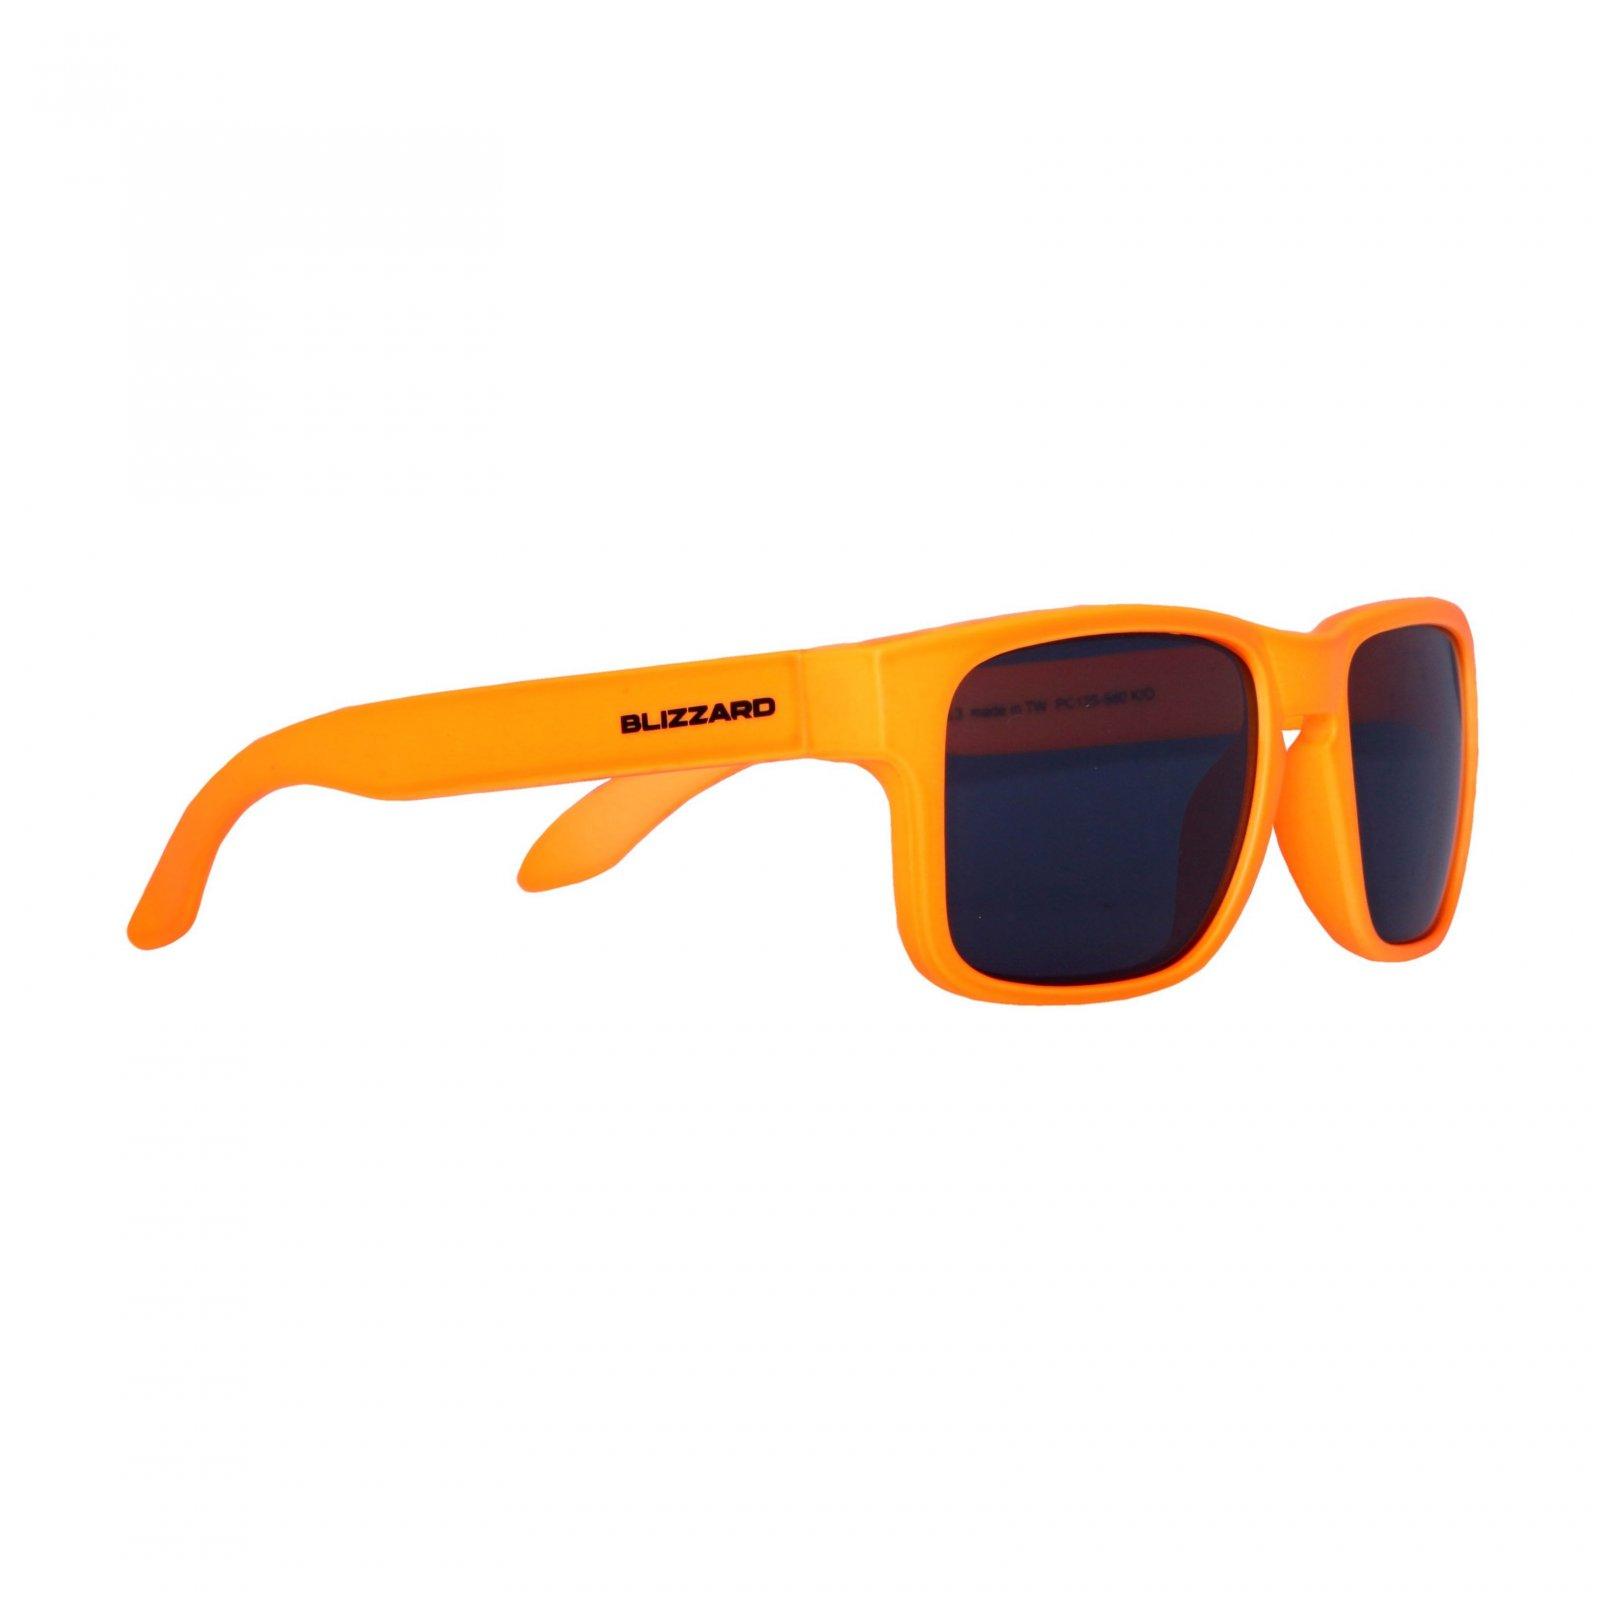 2b0994b35 Blizzard Sun Glasses PC125-880 Neon Orange Matt - Actisport.sk